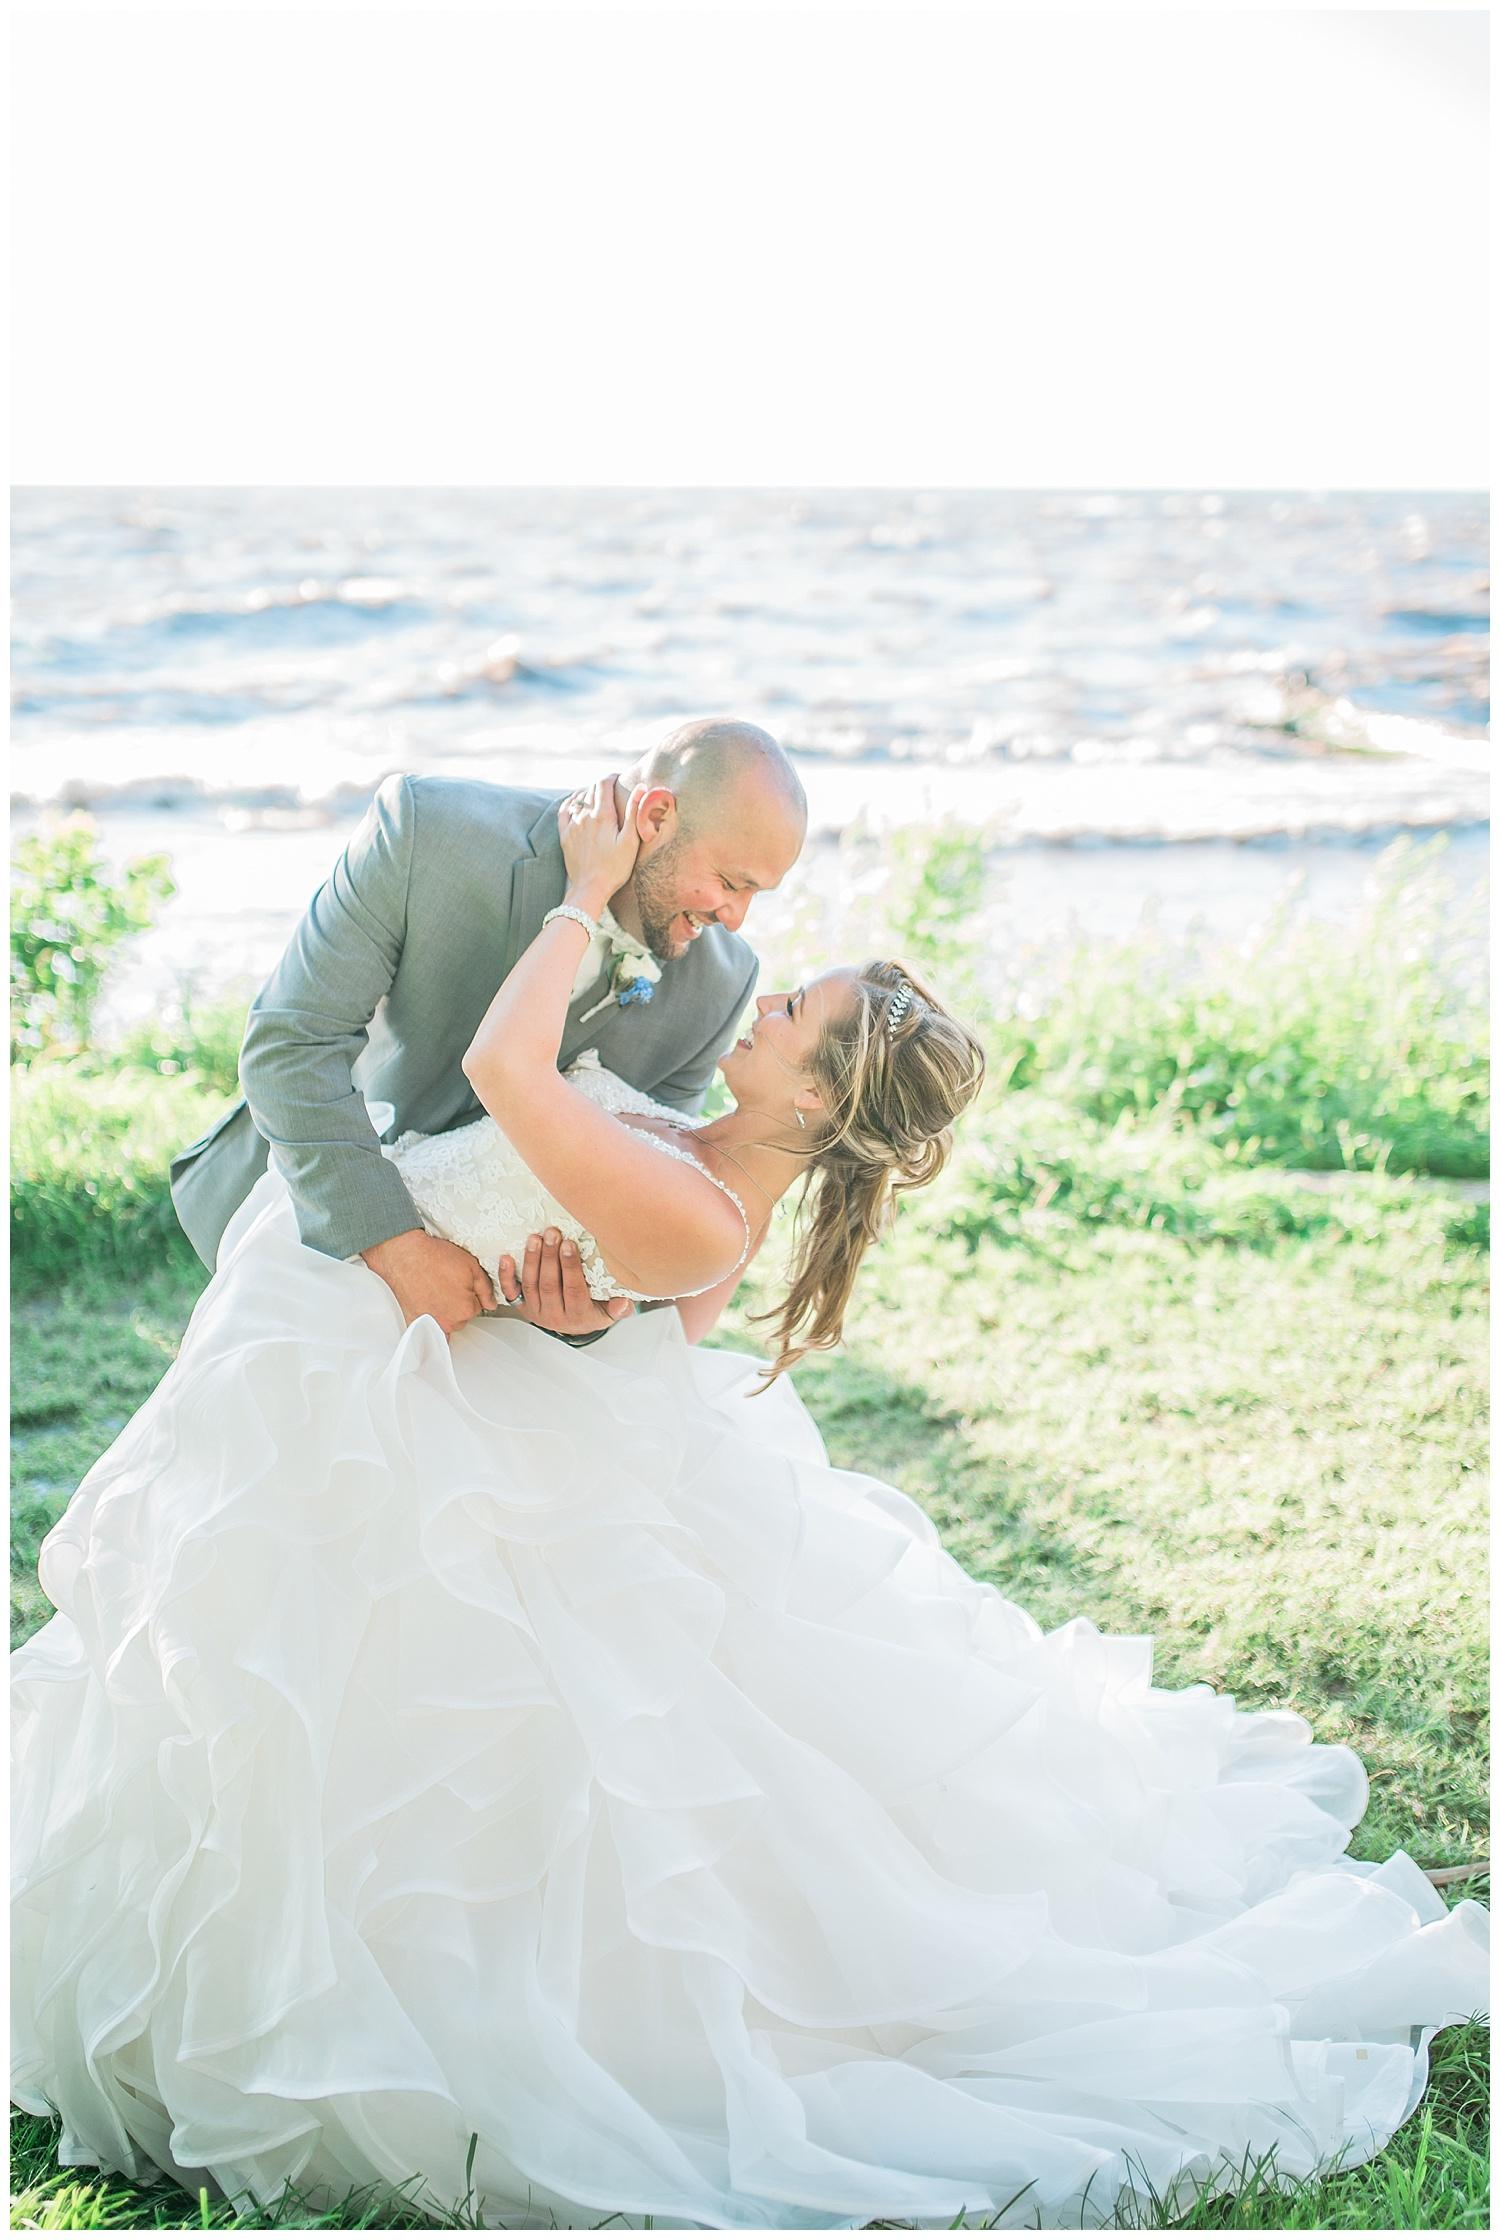 Sean and Andrea - Webster wedding - lass and beau-1027_Buffalo wedding photography.jpg